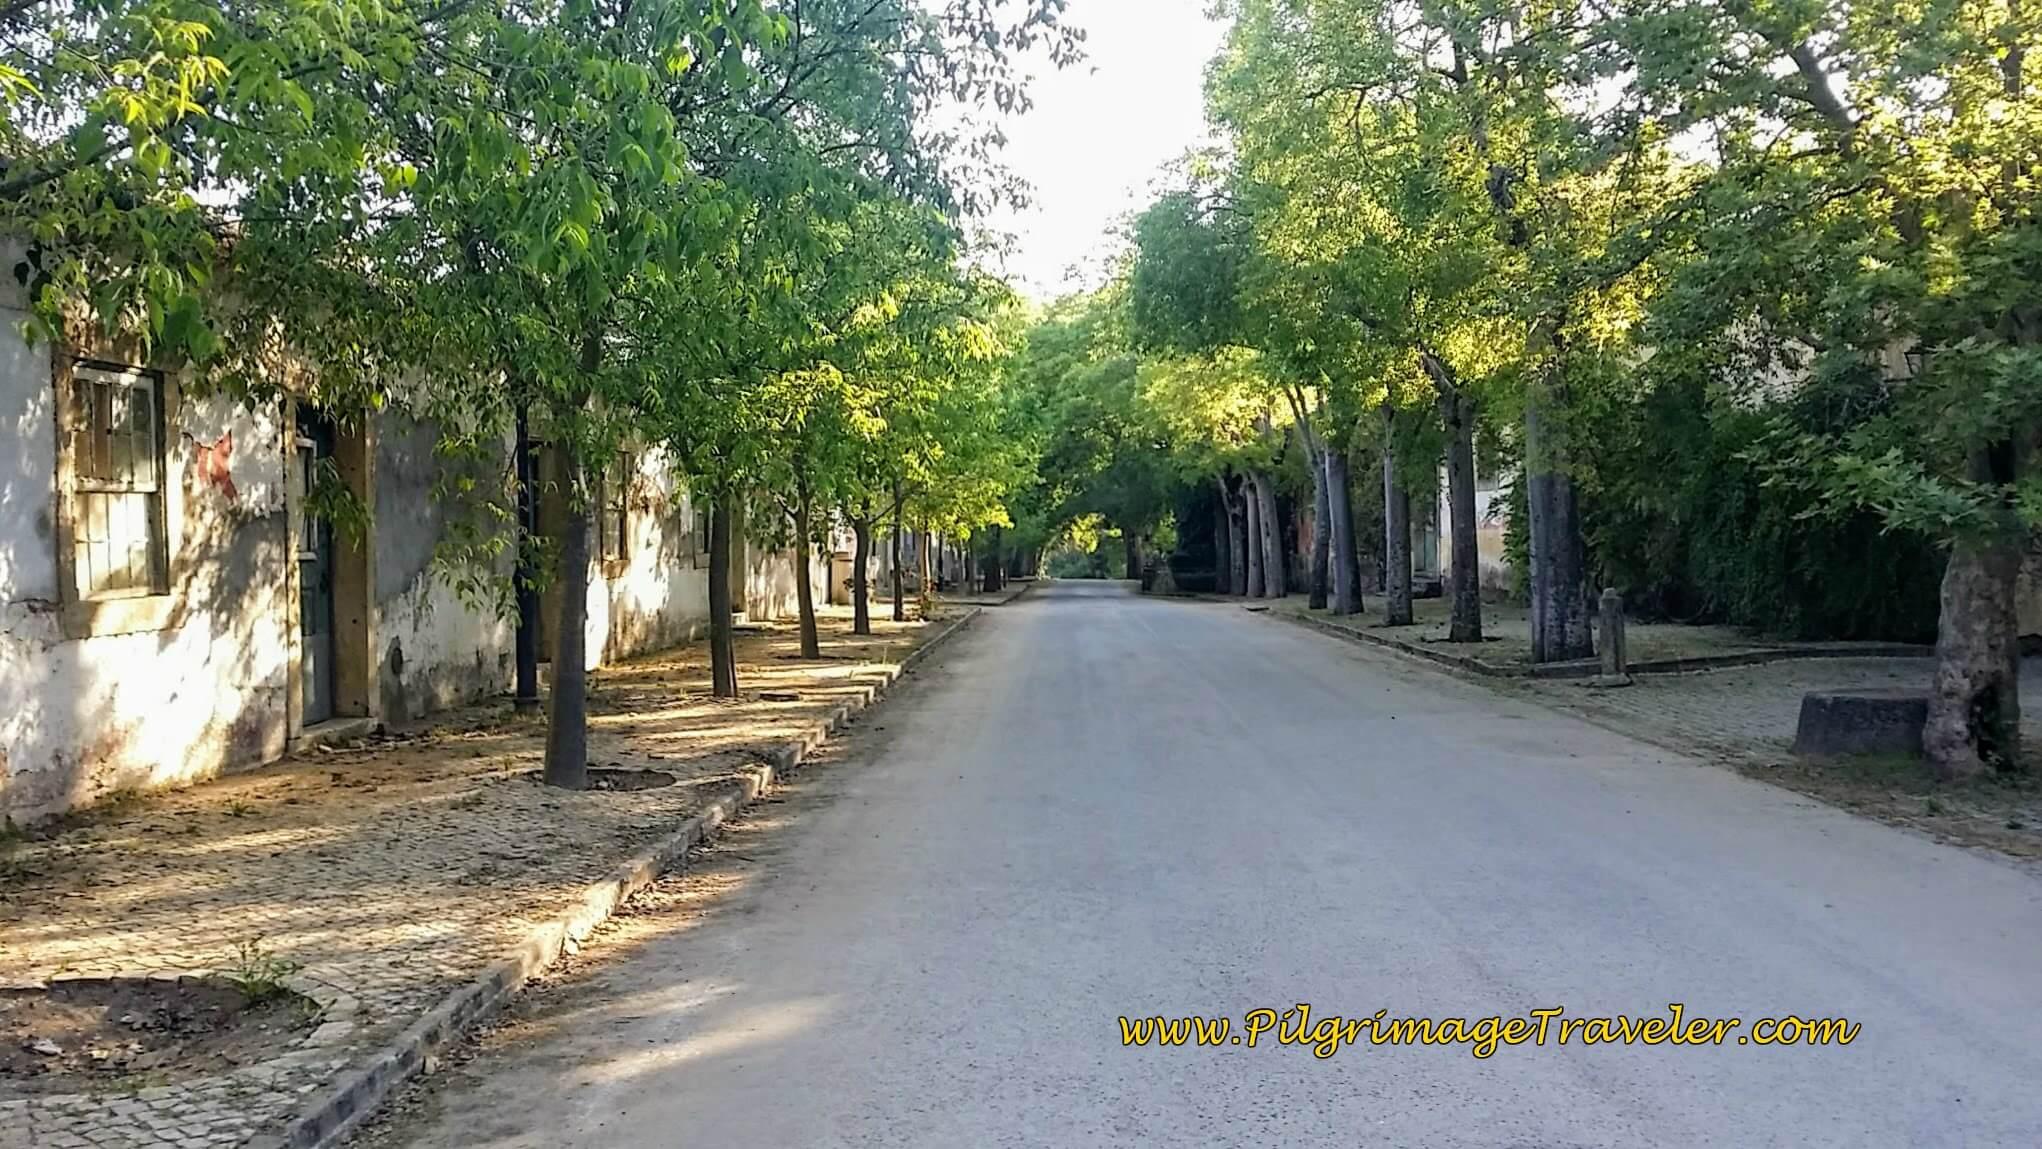 Tree-lined Street in the Quinta da Cardiga